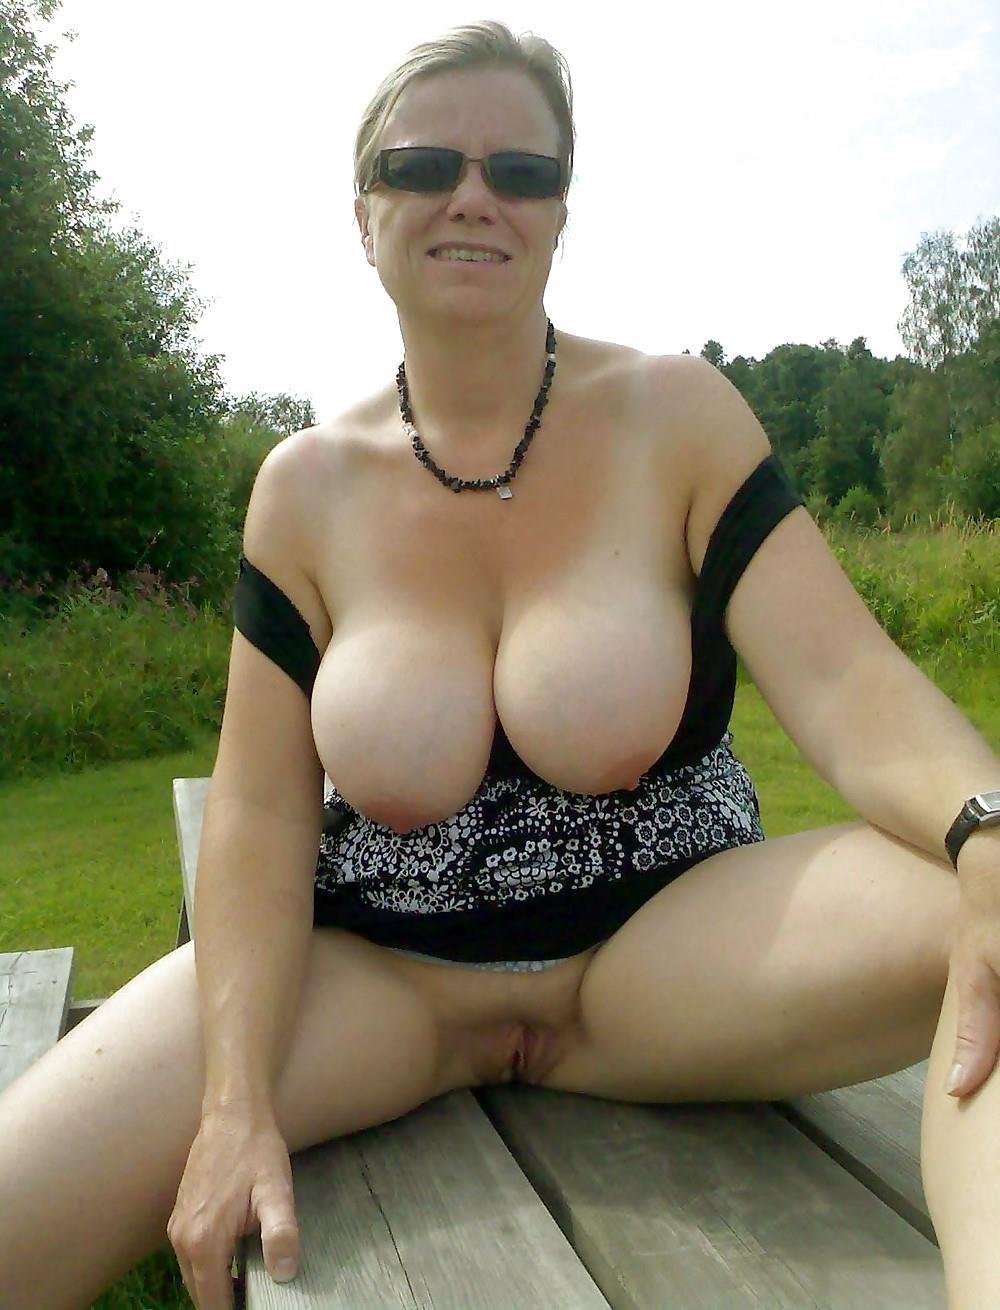 Vintage big tits pictures-2433